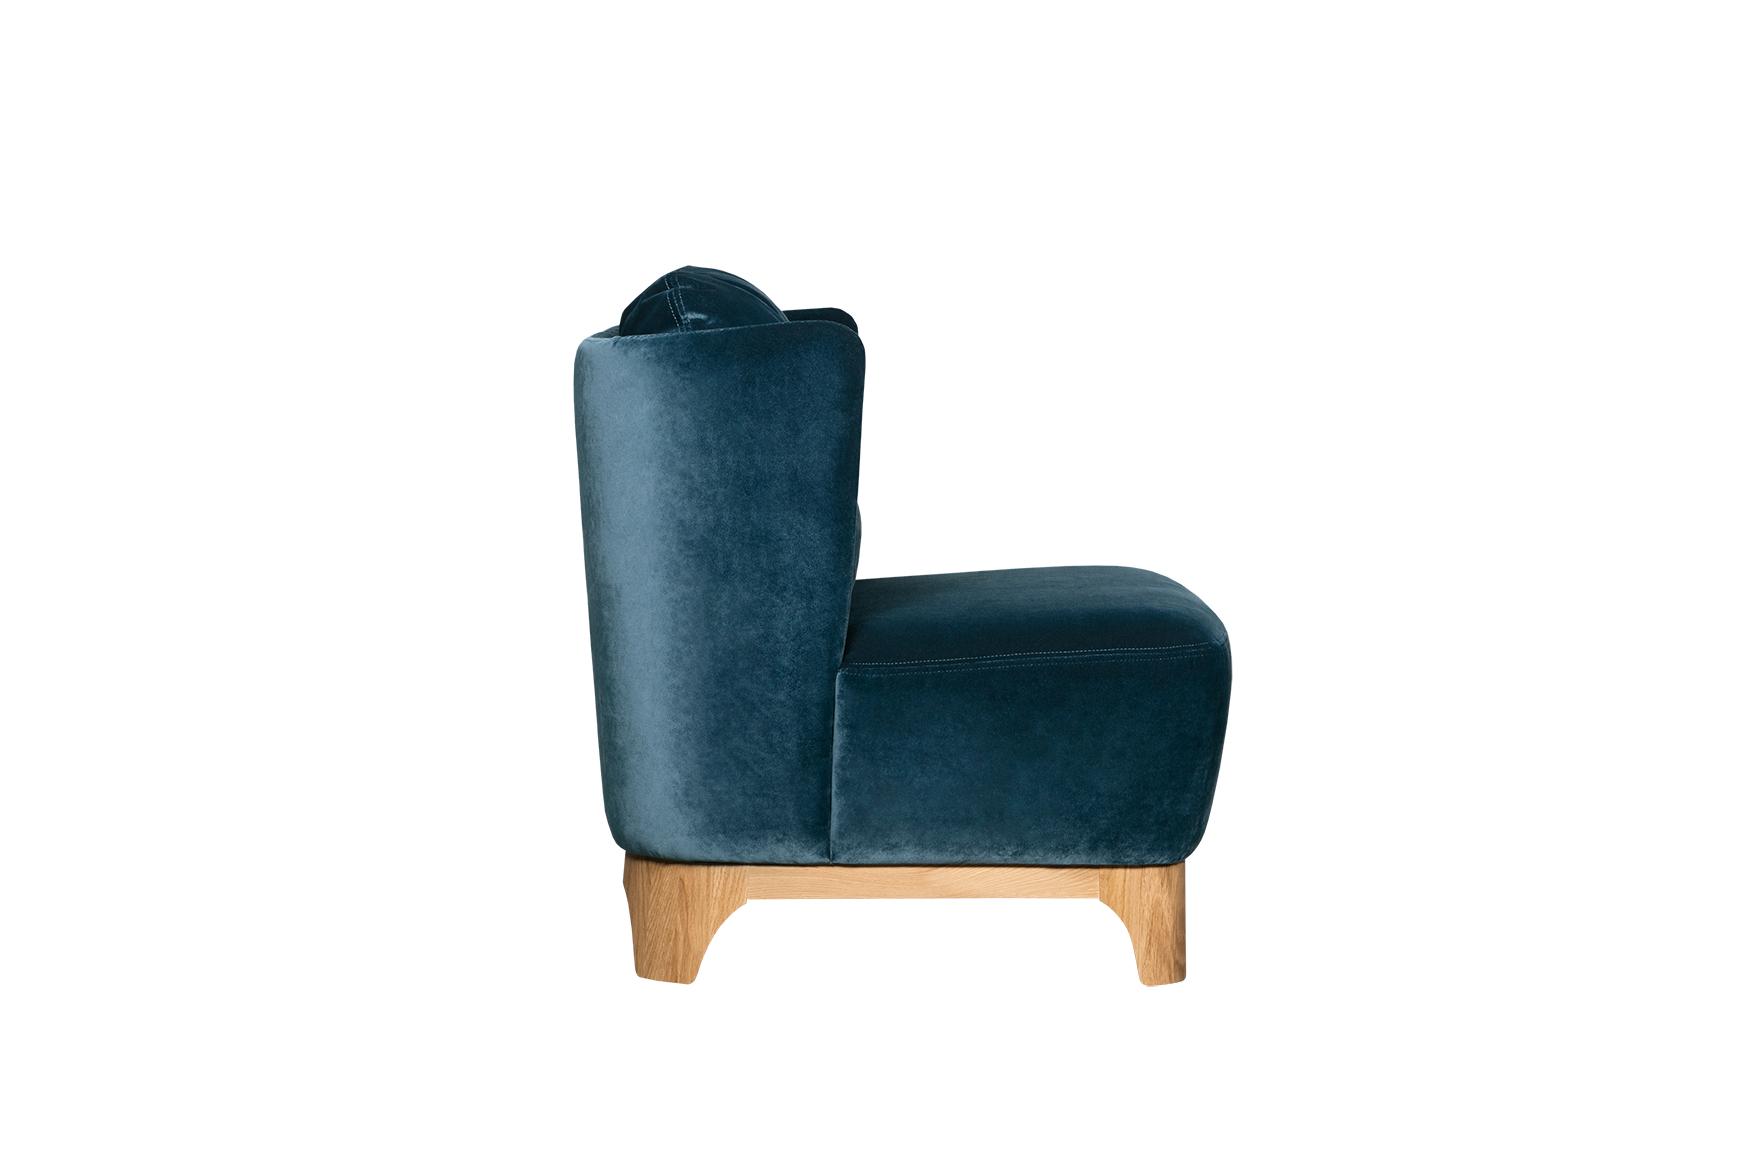 ALMA_armchair_buttons_classic_velvet12_navy_blue_3